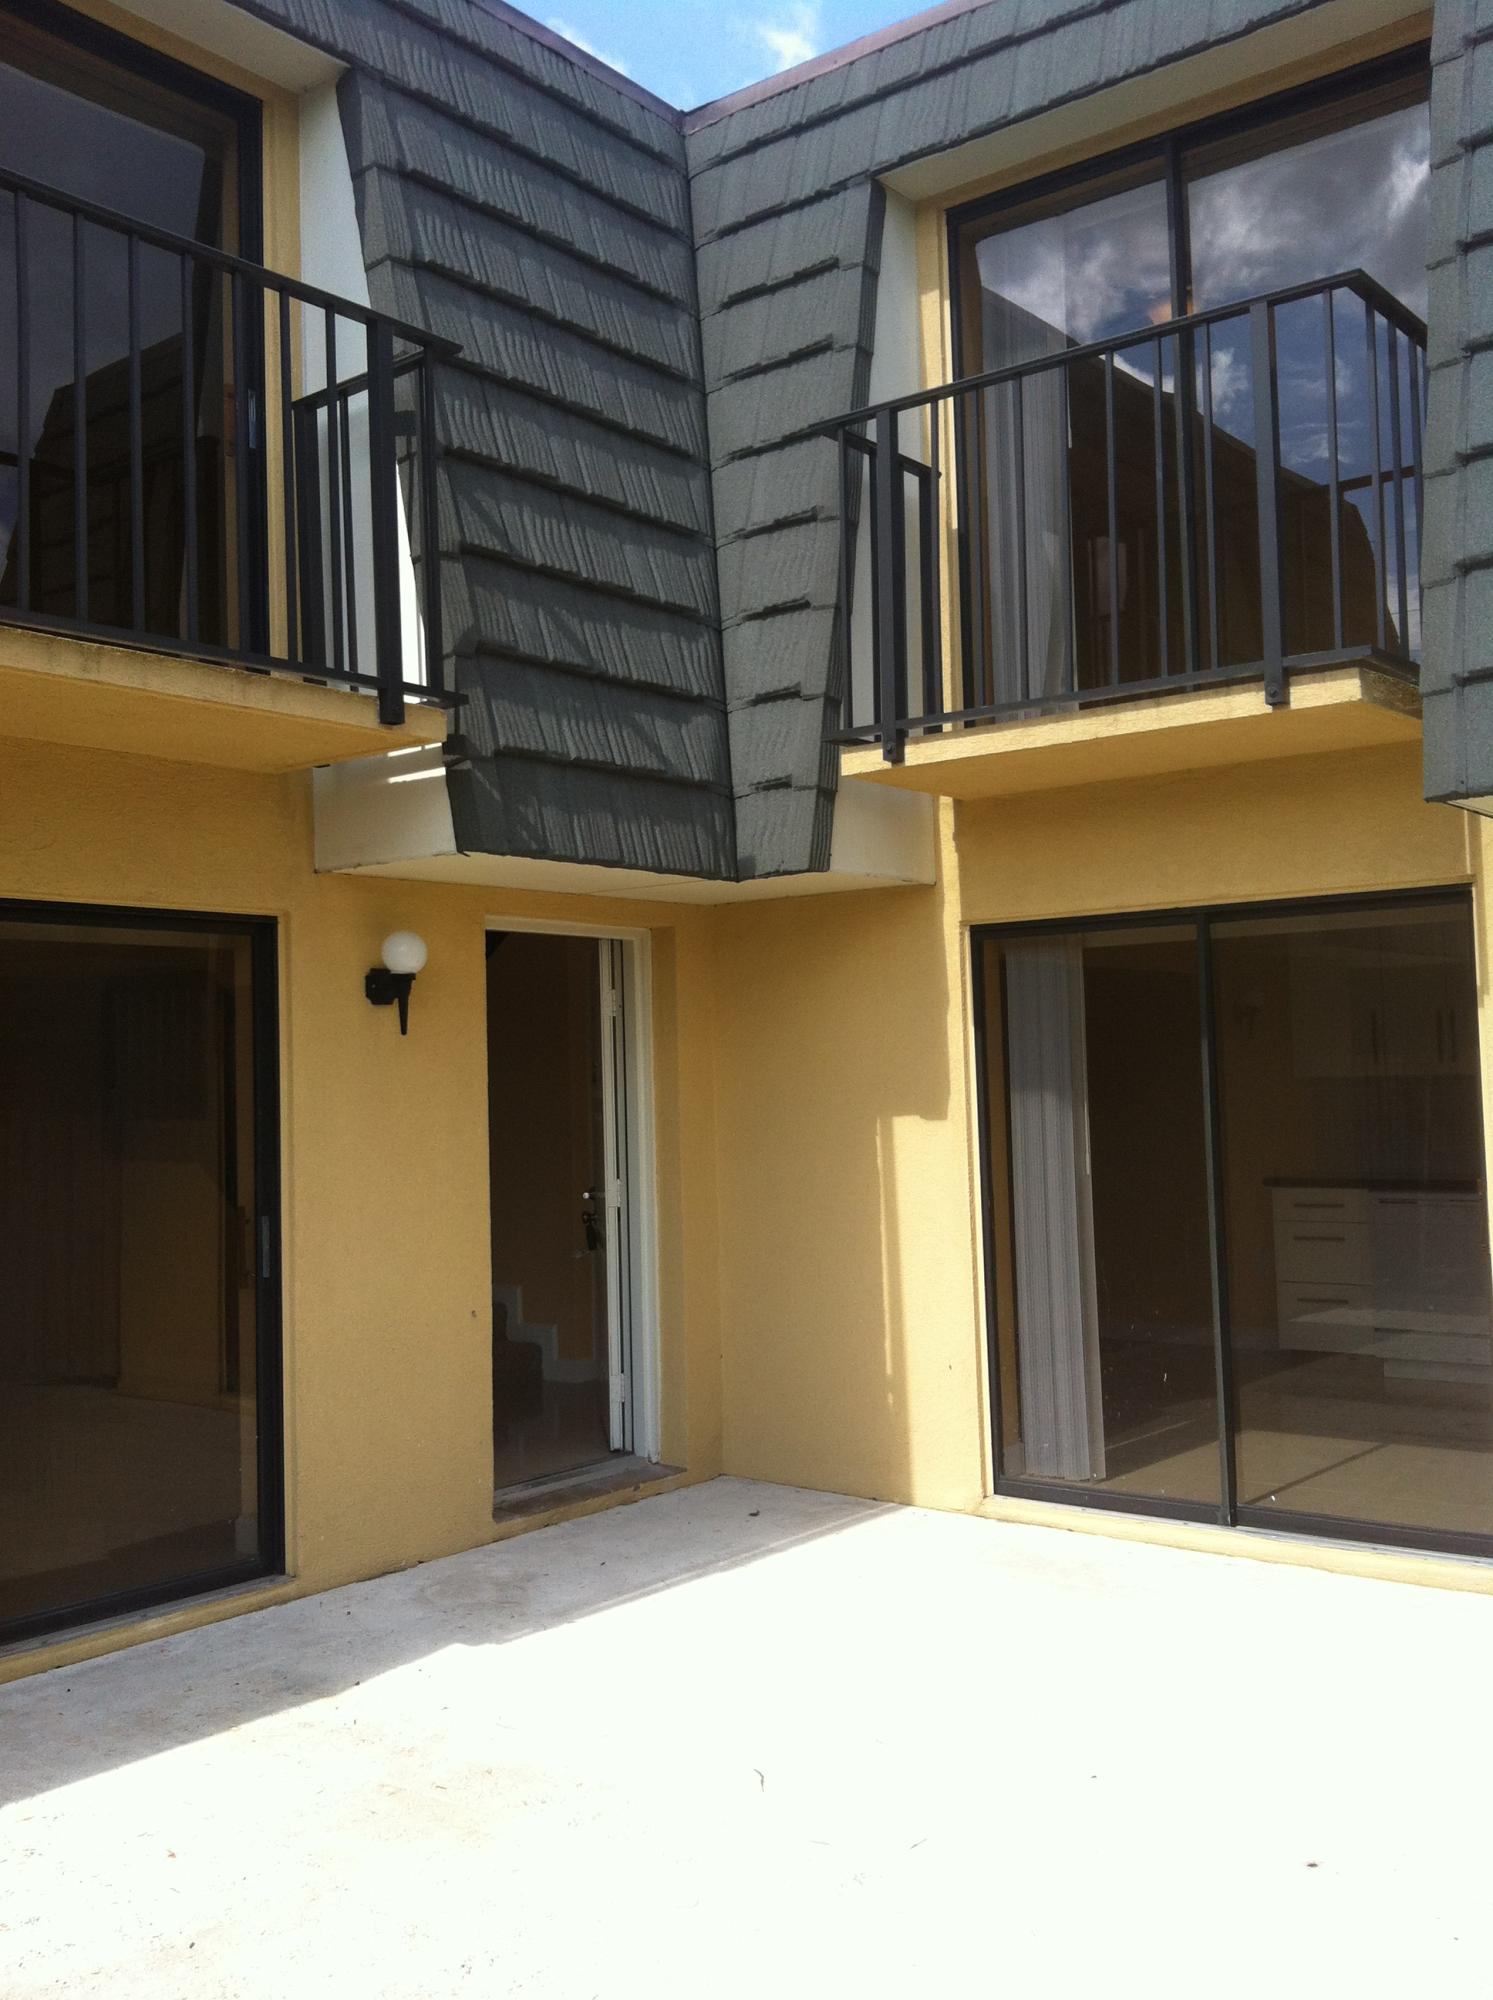 2310 23rd Way, West Palm Beach, Florida 33407, 2 Bedrooms Bedrooms, ,2 BathroomsBathrooms,Rental,For Rent,23rd,RX-10568177